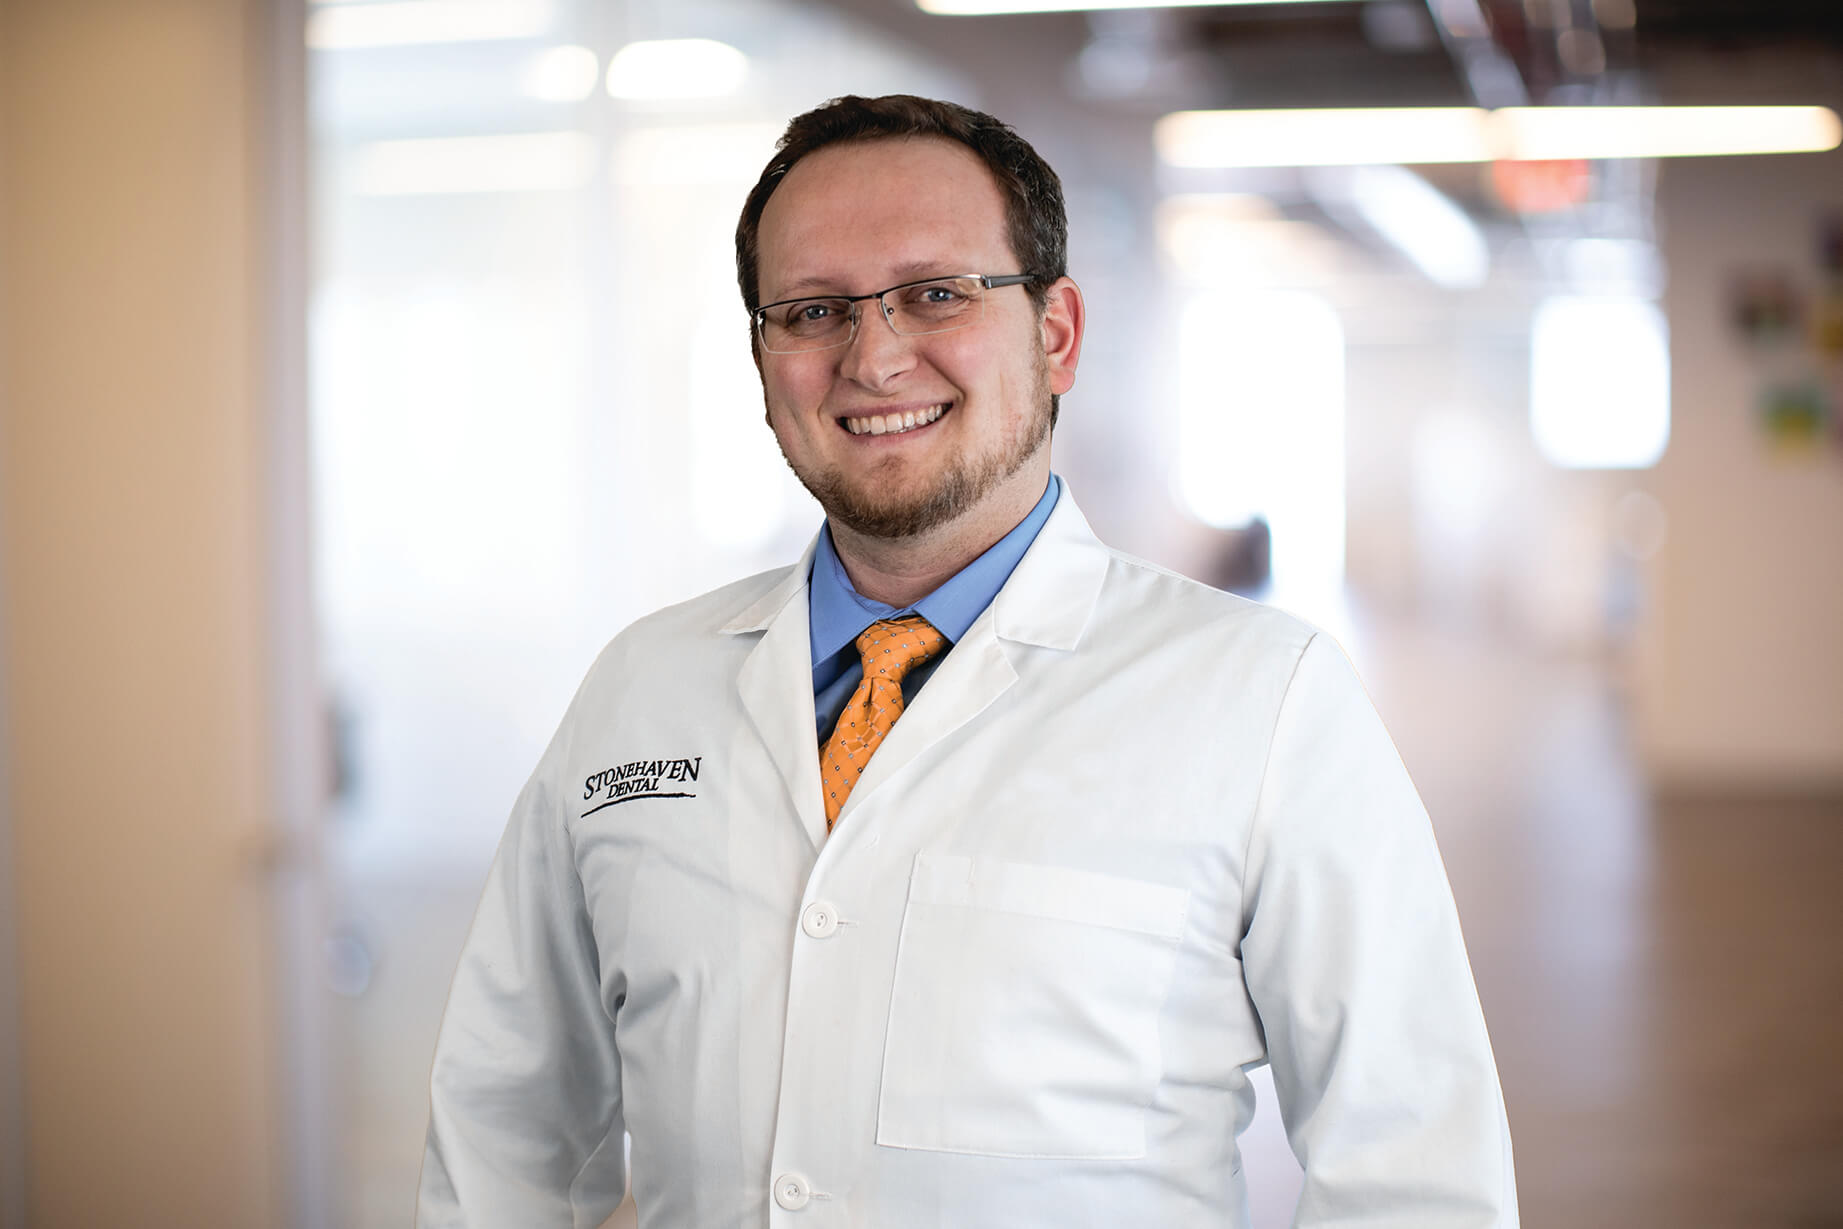 Dr. Jason Gordon